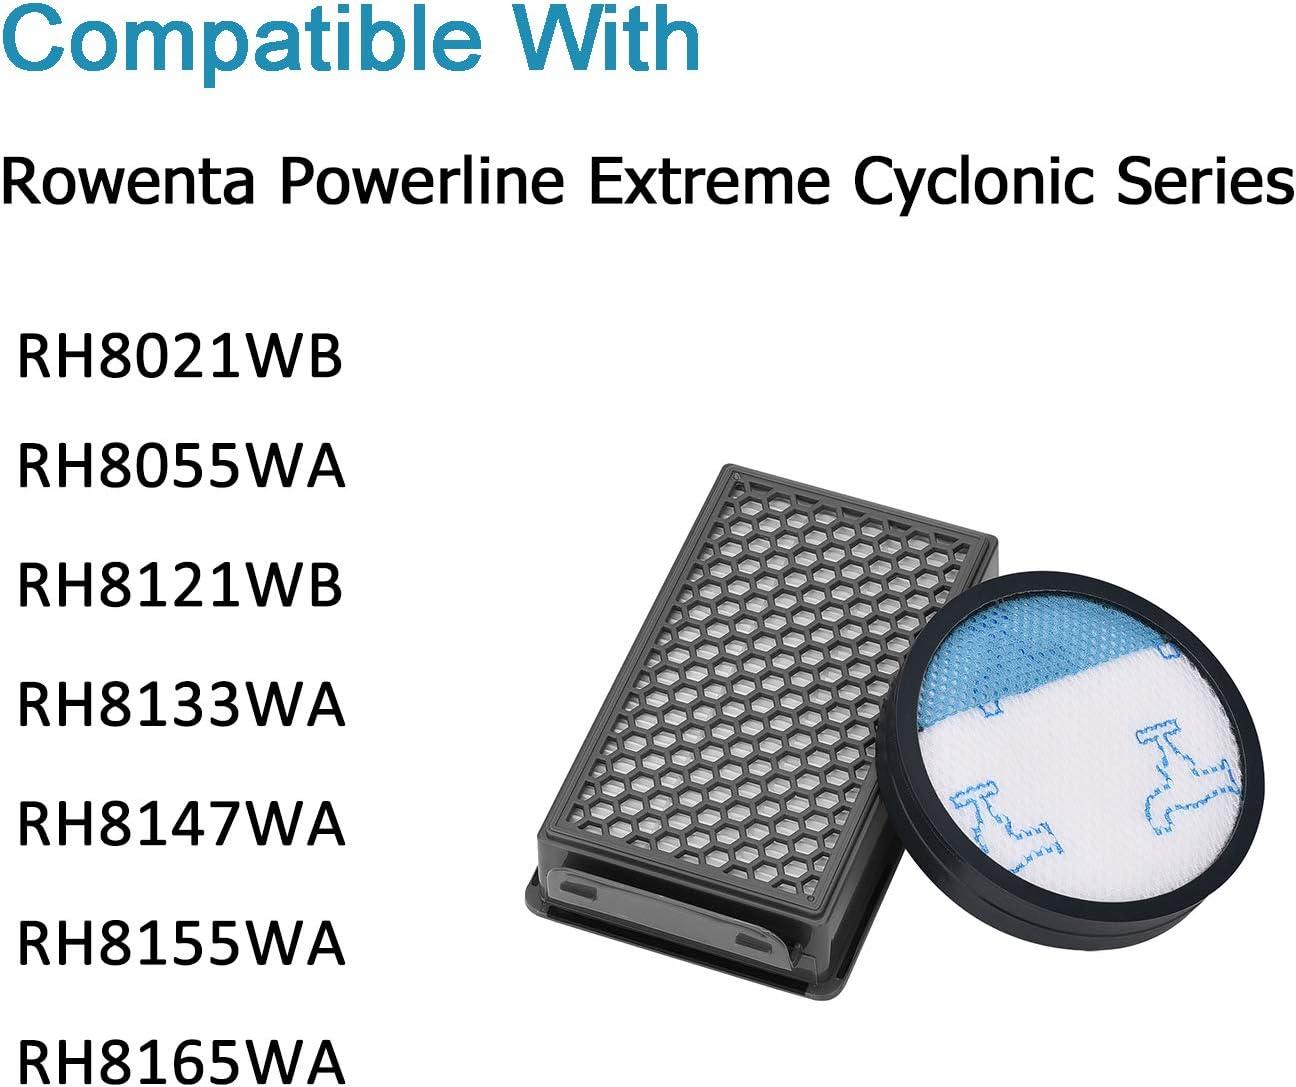 Nrpfell 3 Packs Filtro per Aspirapolvere Rowenta Powerline Extreme Cyclonic Ricambi Filtri Accessori RH8021WB RH8055WA ZR903601